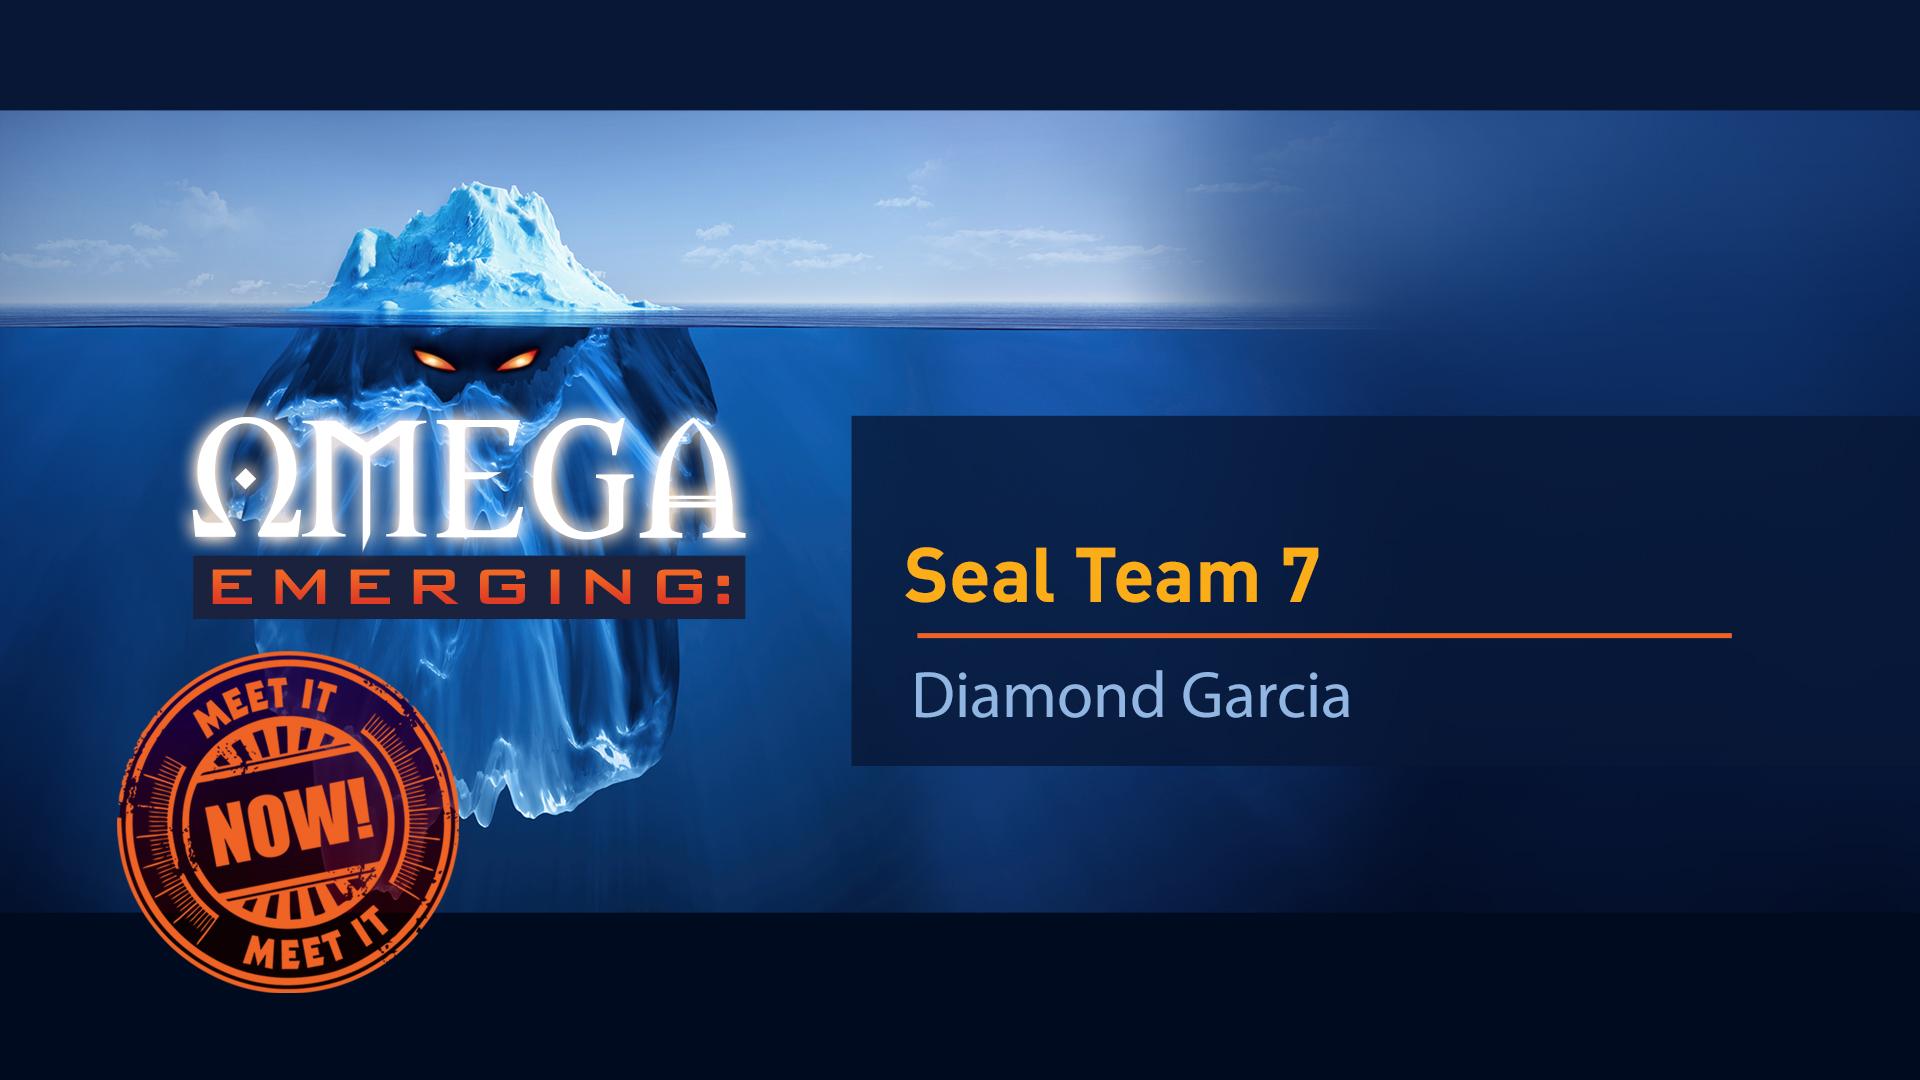 3. Seal Team 7 - Diamond Garcia